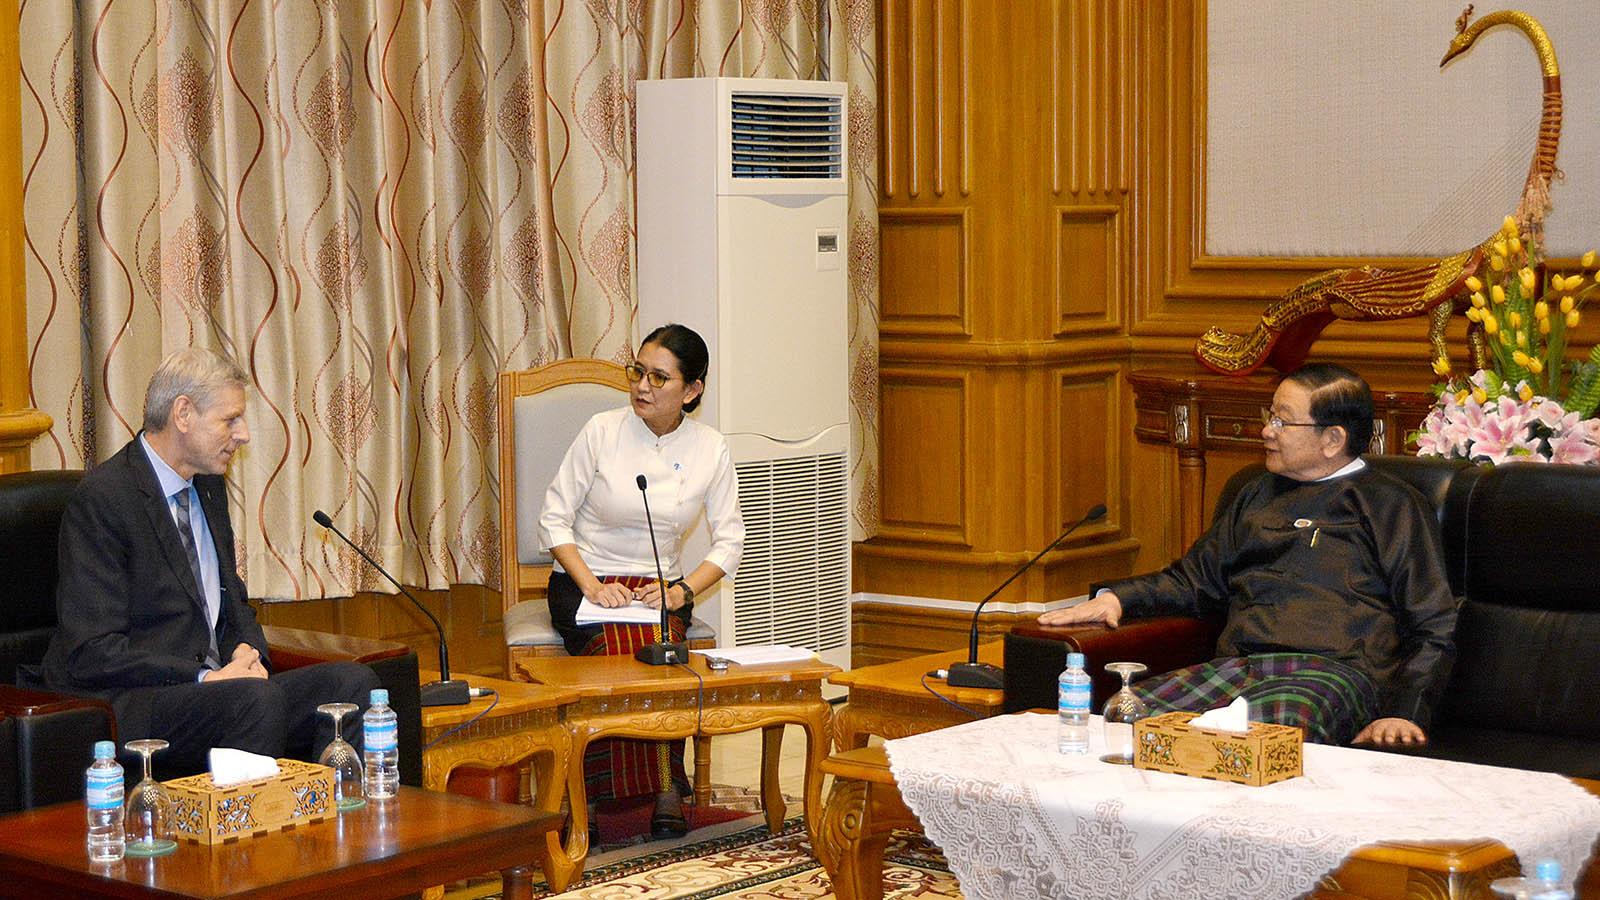 Pyithu Hluttaw Speaker U T Khun Myat meets with Mr Jan Hornik, Vice President of the Czech Republic's Senate, in Nay Pyi Taw yesterday.Photo: MNA